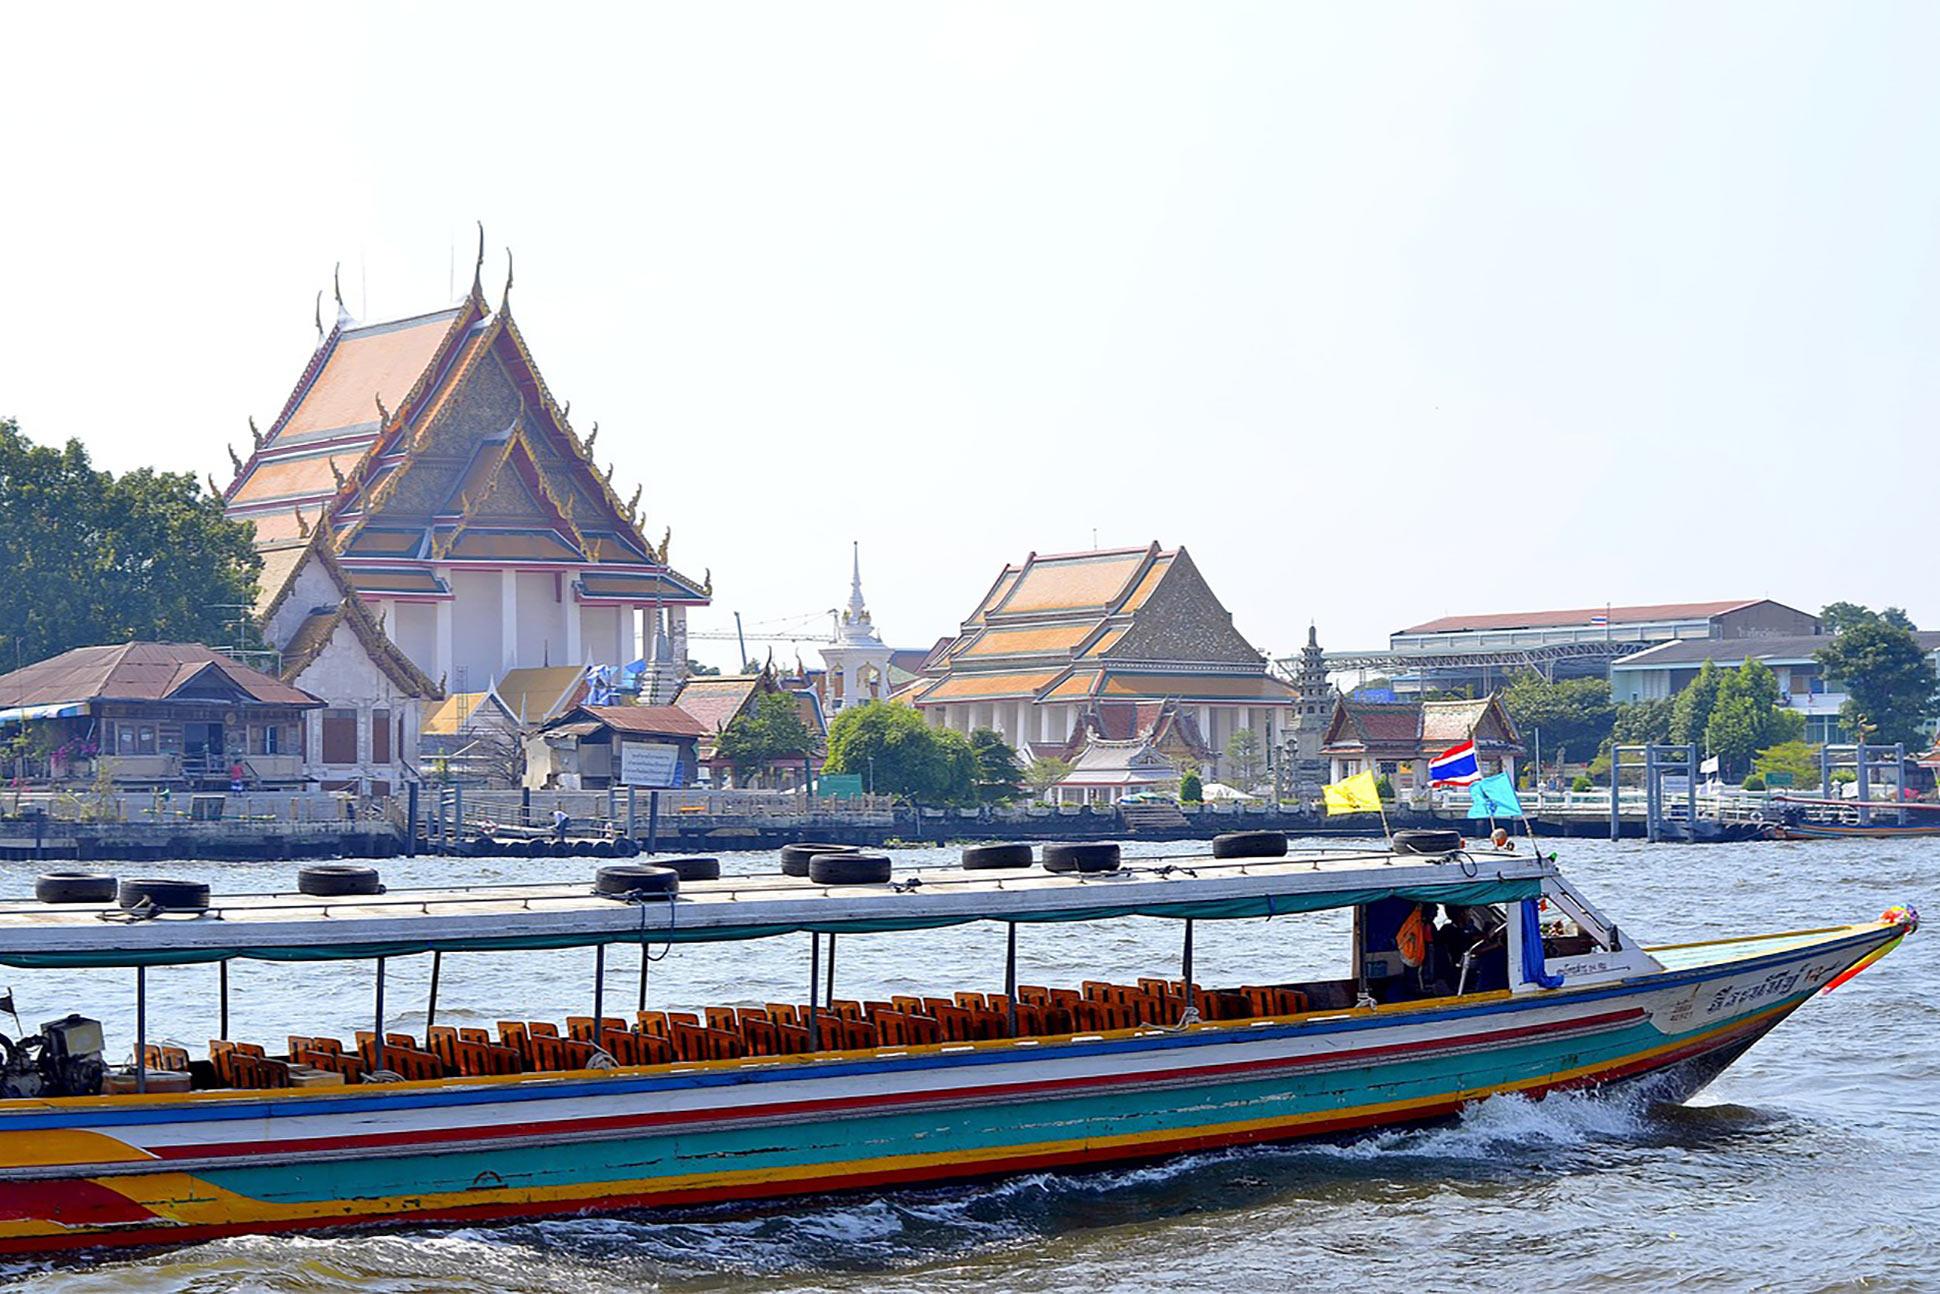 A boat on the Chao Phraya River, Bangkok, Thailand